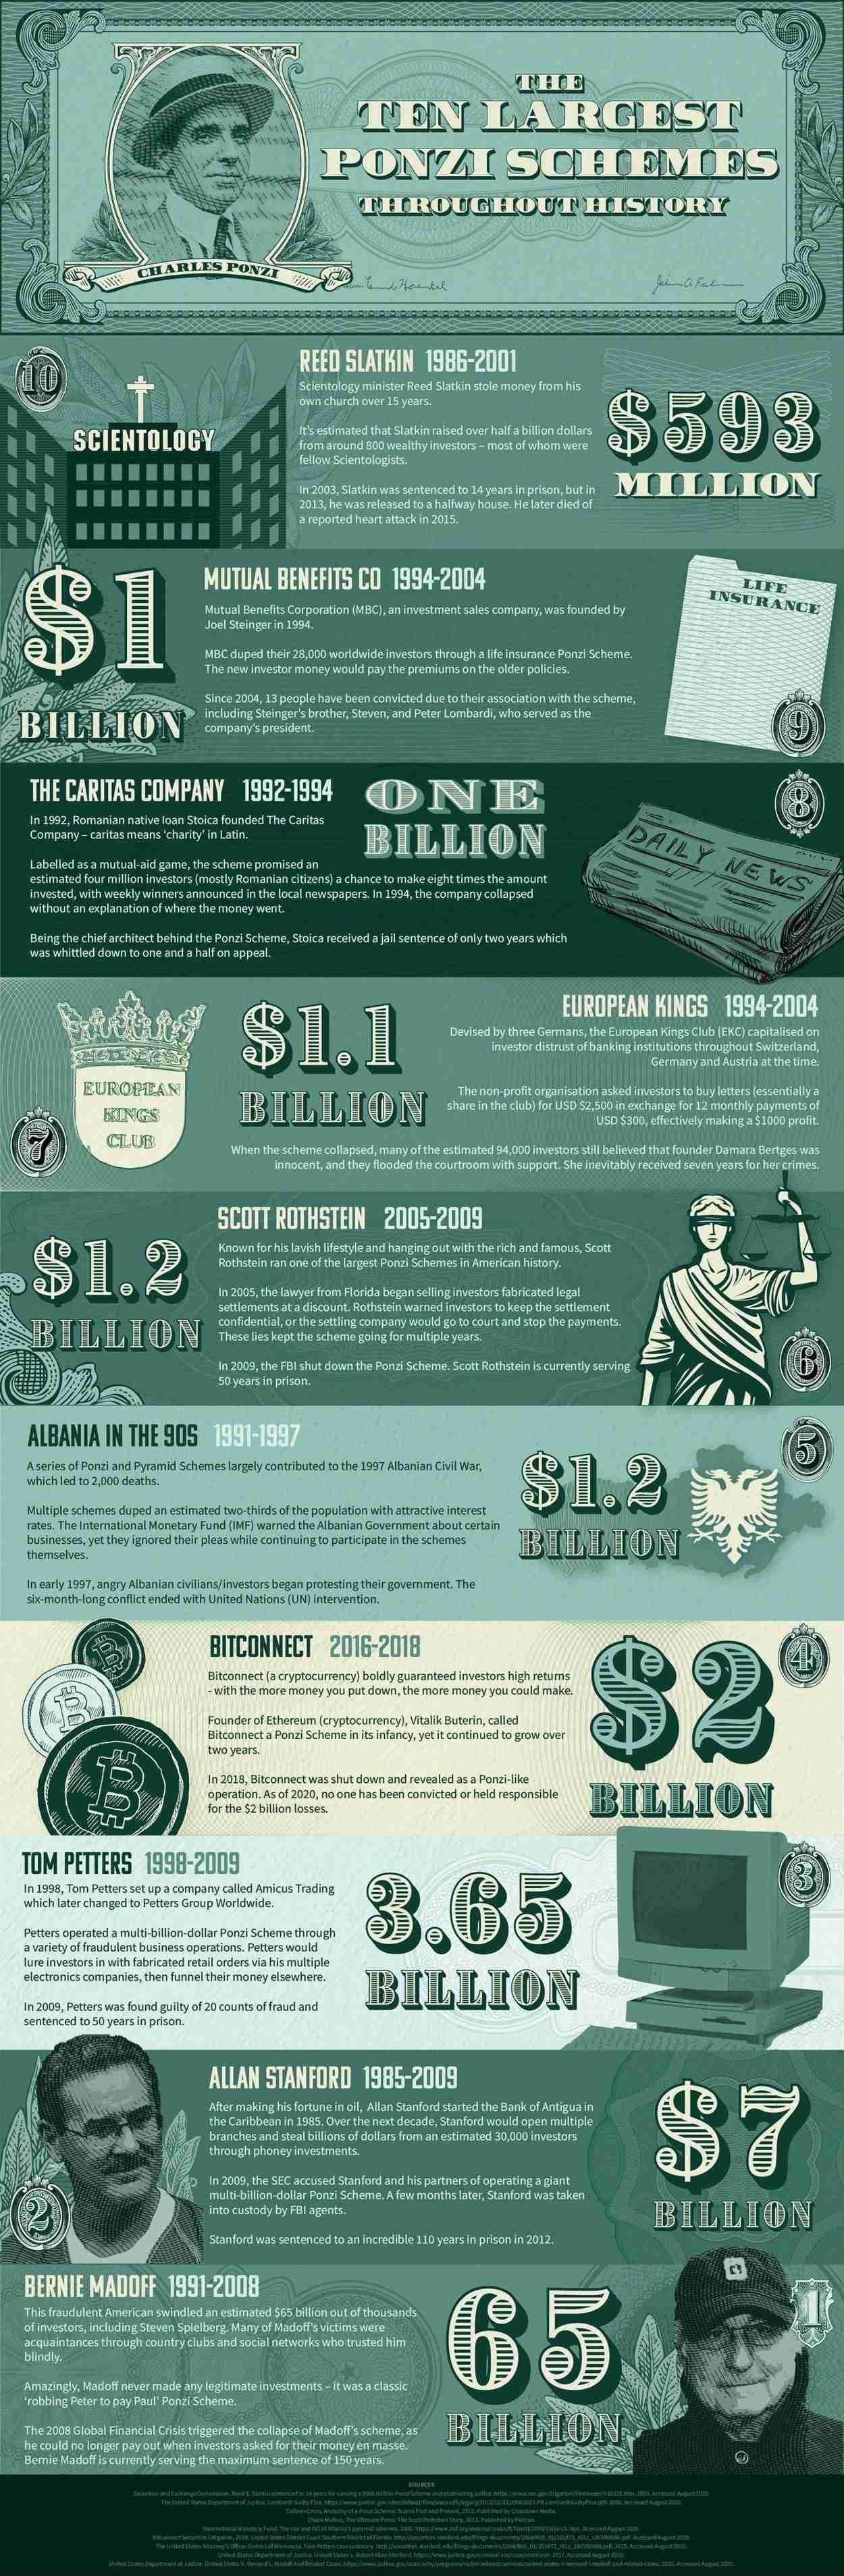 10 largest Ponzi Schemes in History